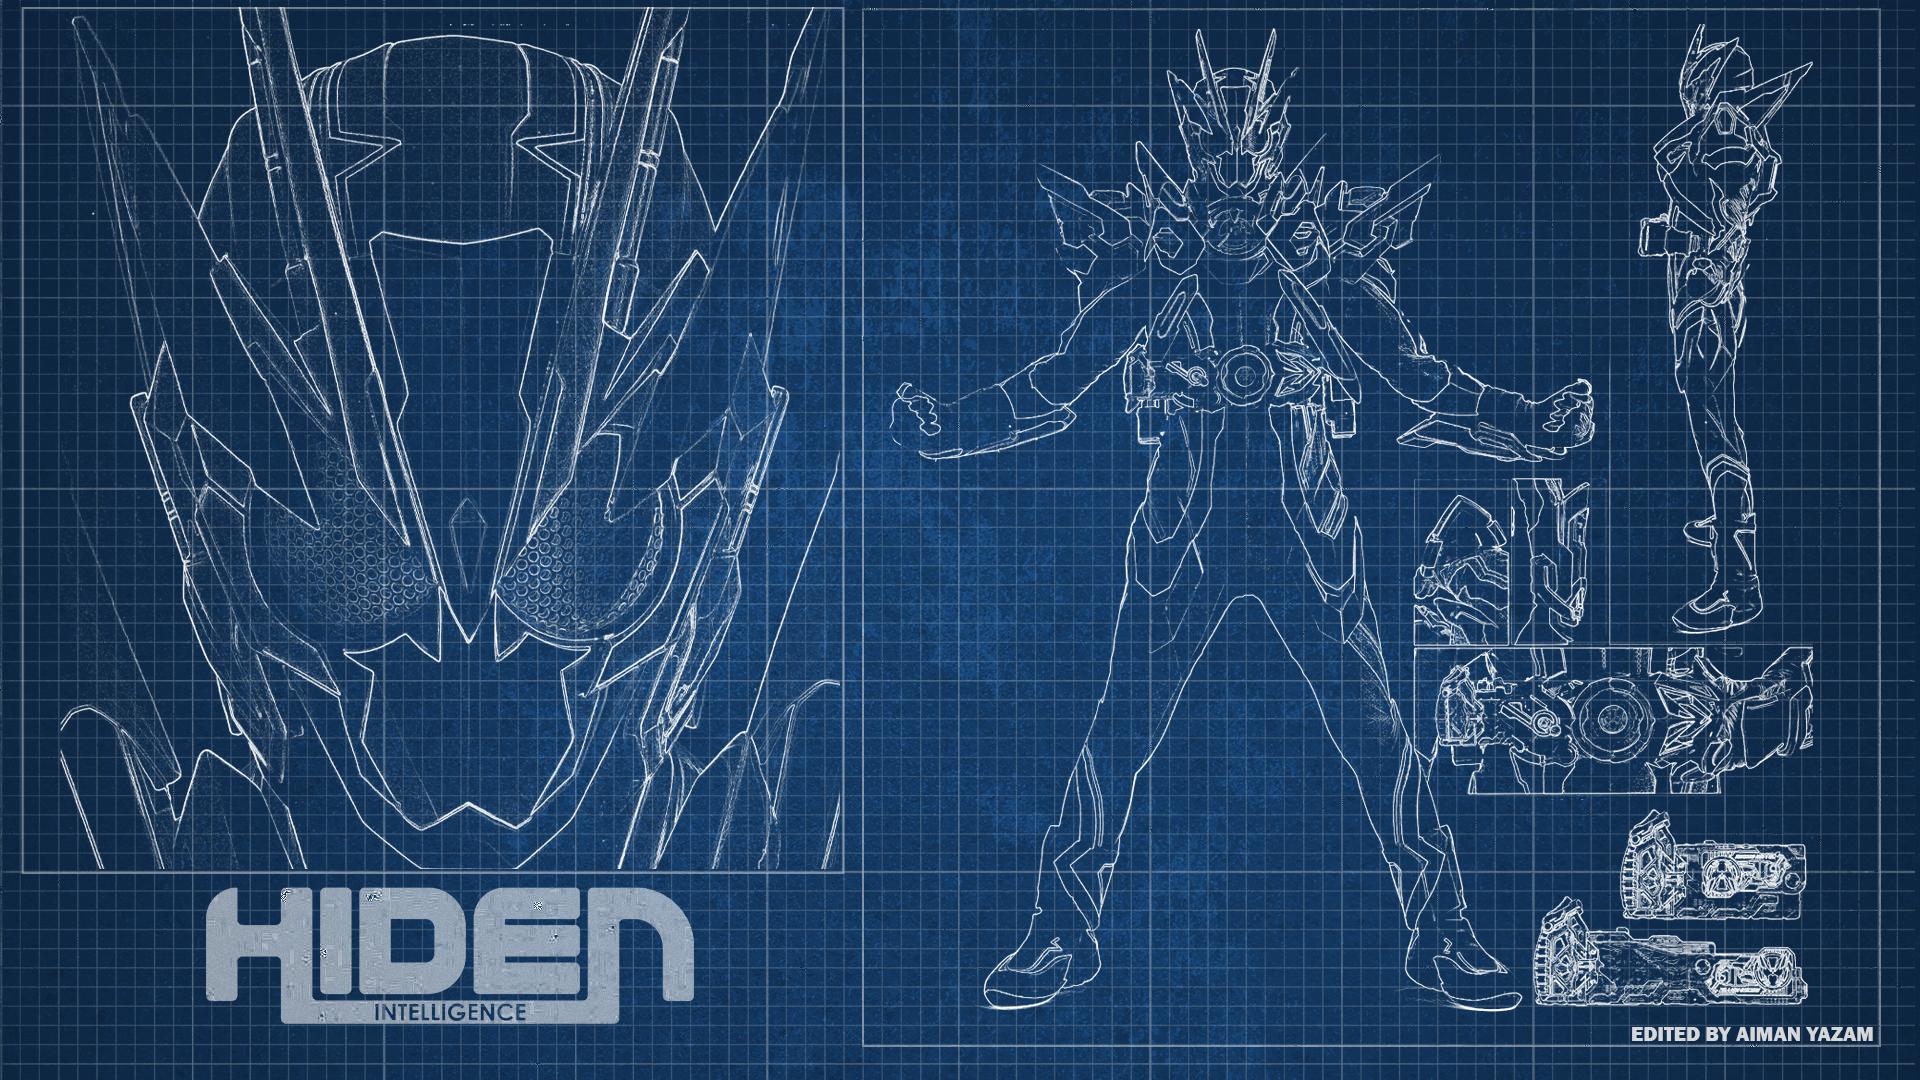 General 1920x1080 kamen rider zero one Kamen Rider Zero One tokusatsu shining assault form